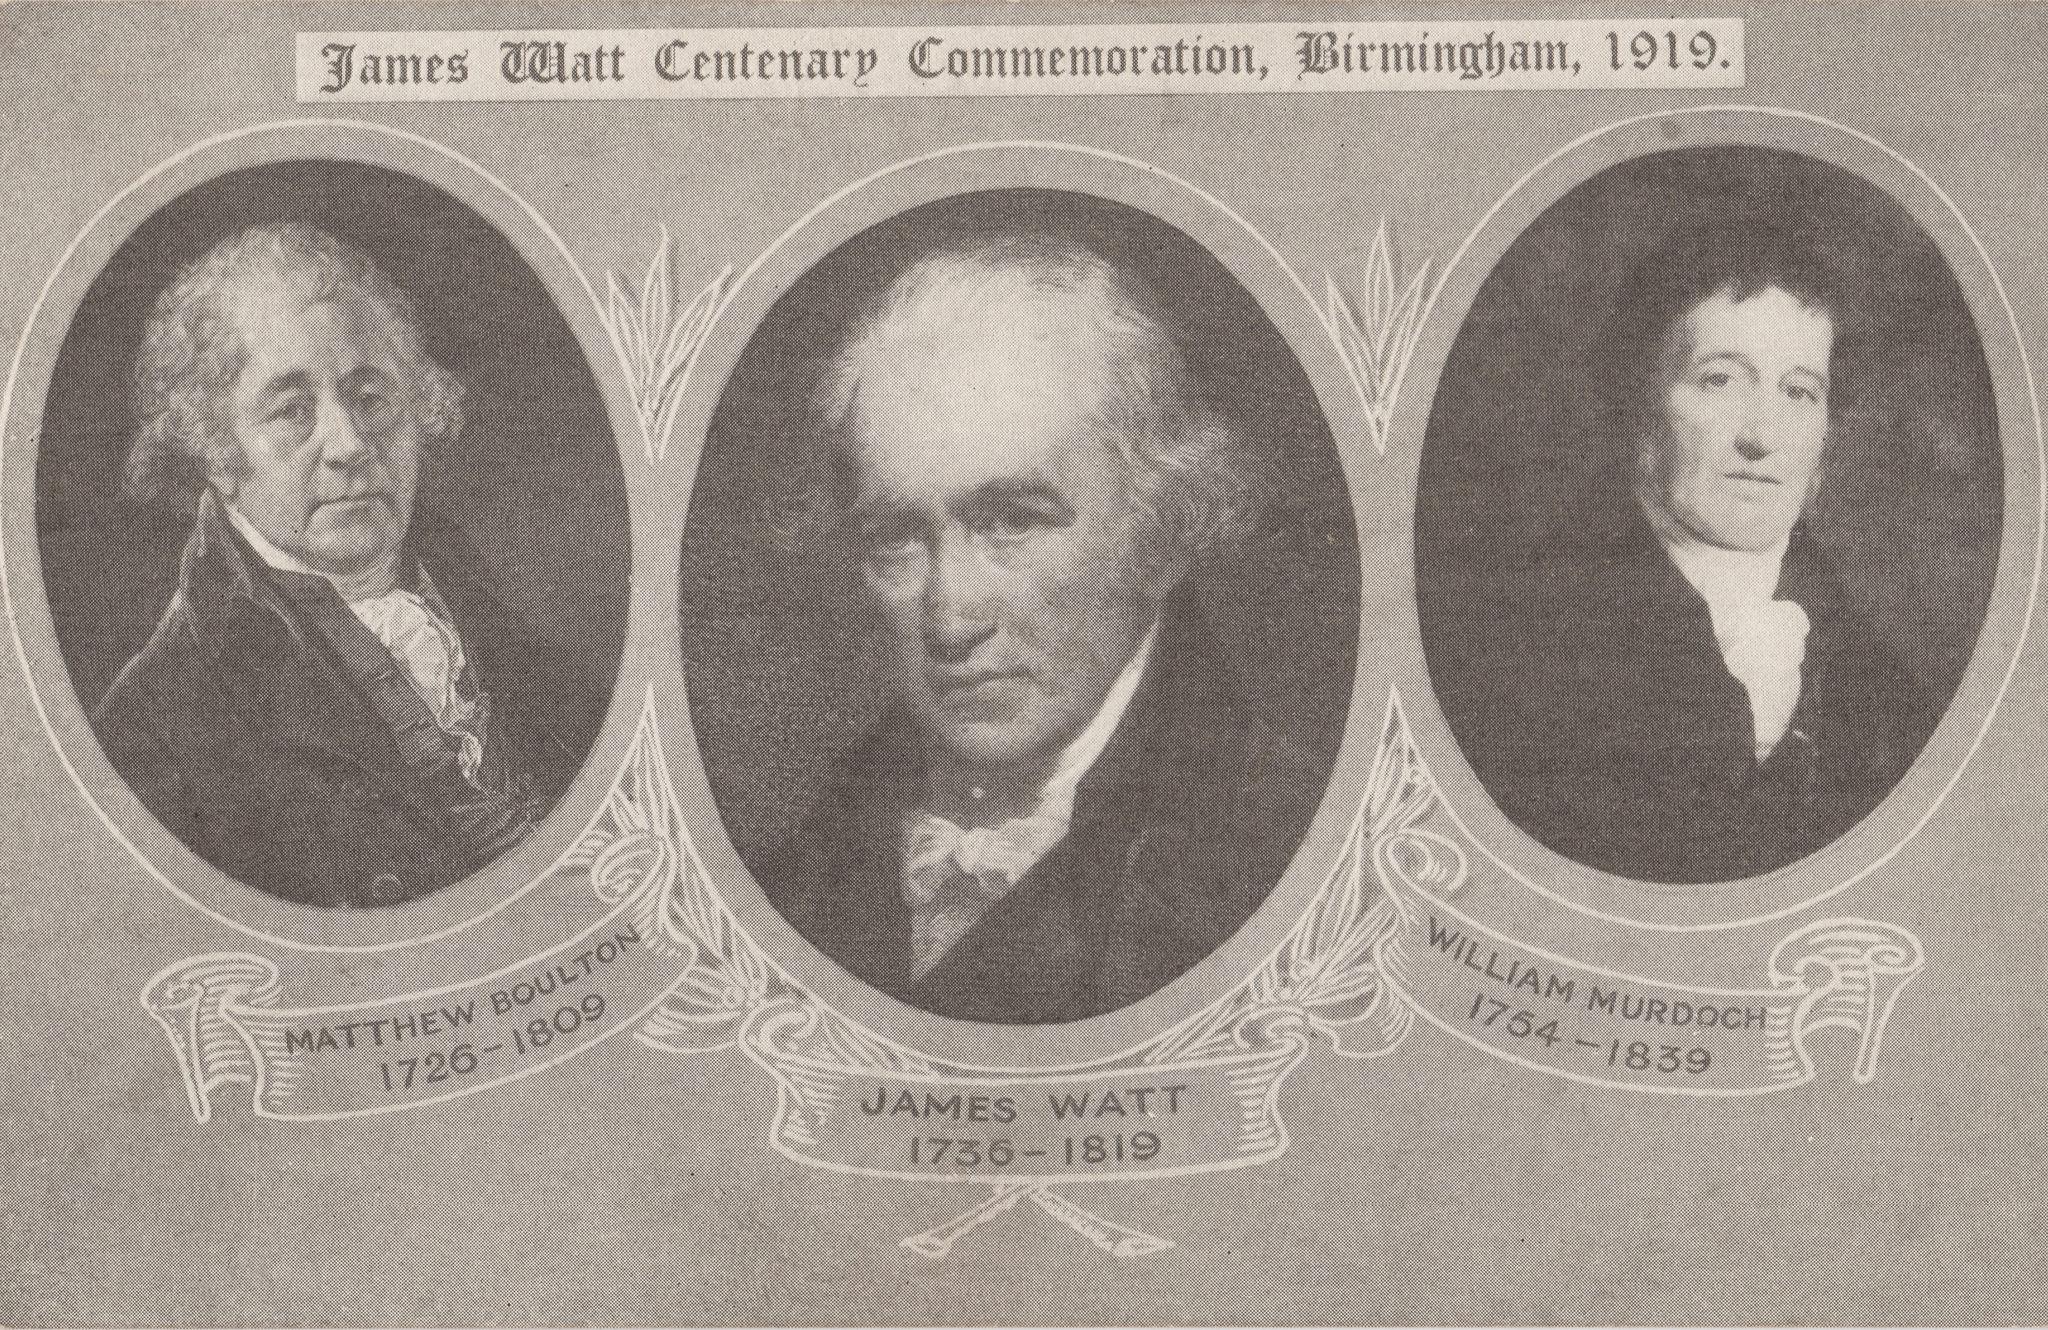 Matthew Boulton, James Watt and William Murdoch